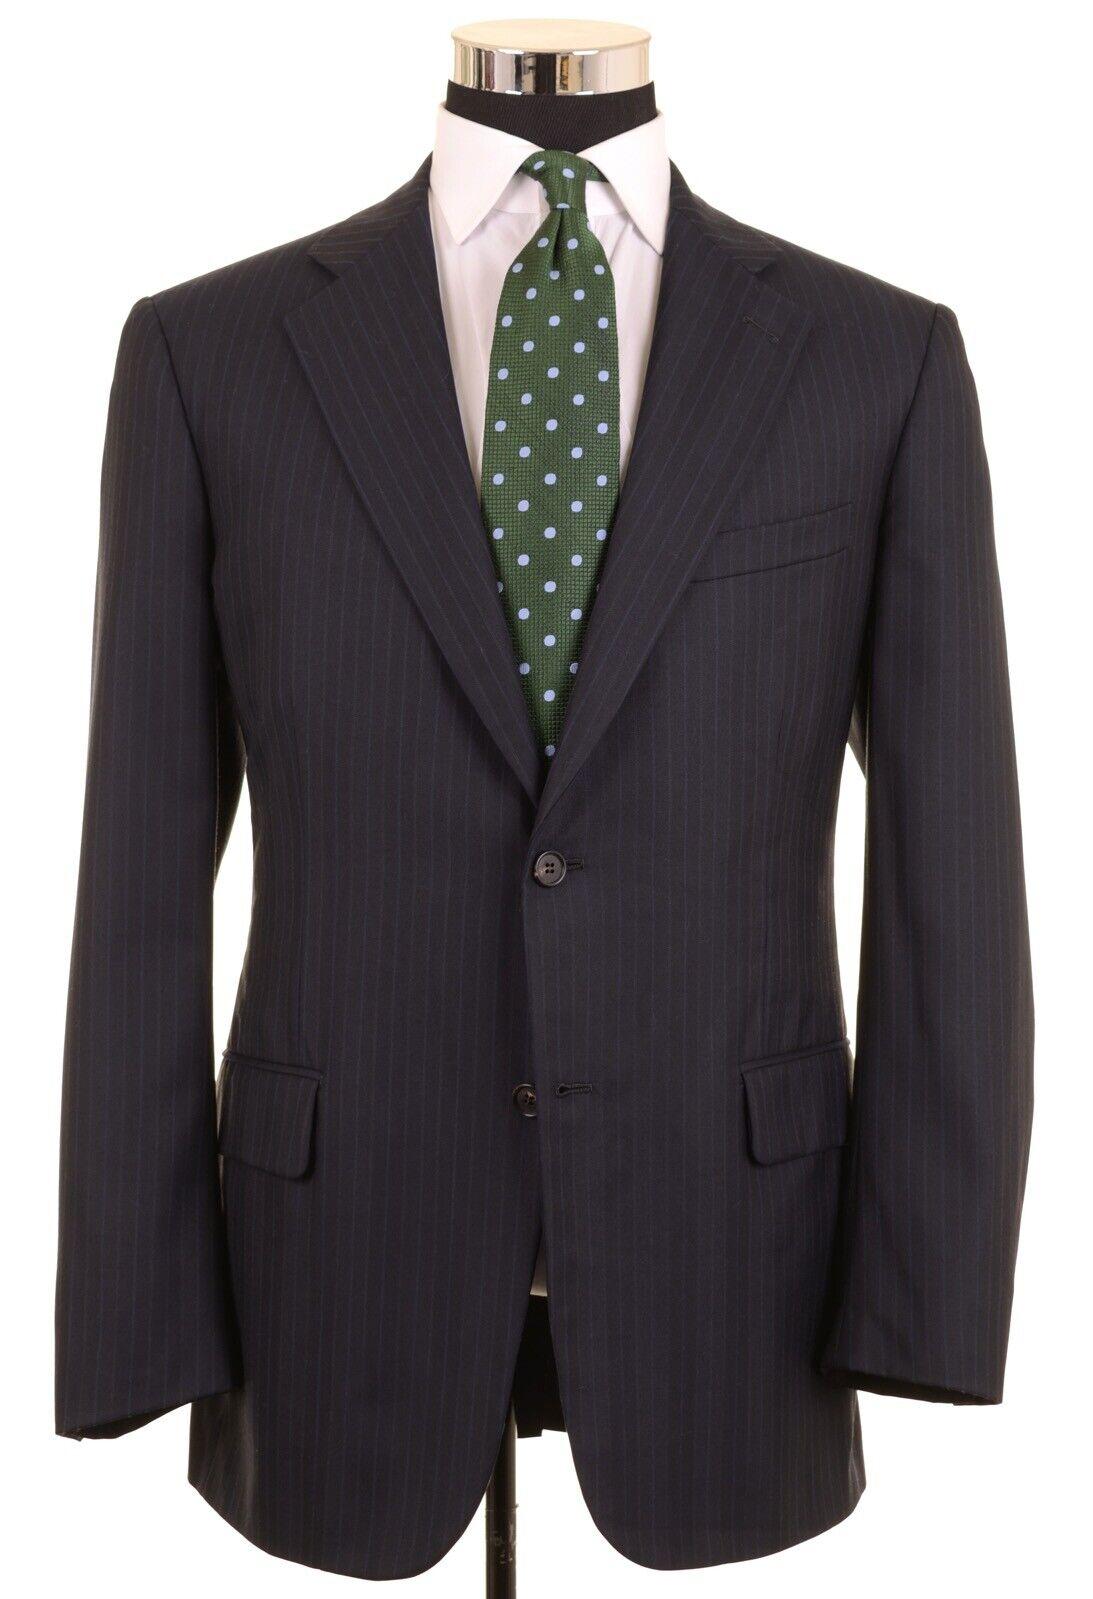 Brooks Brothers GelbGolden Fleece Blau Gestreift Wolle 2pc Anzug Jacke Hose 41 R